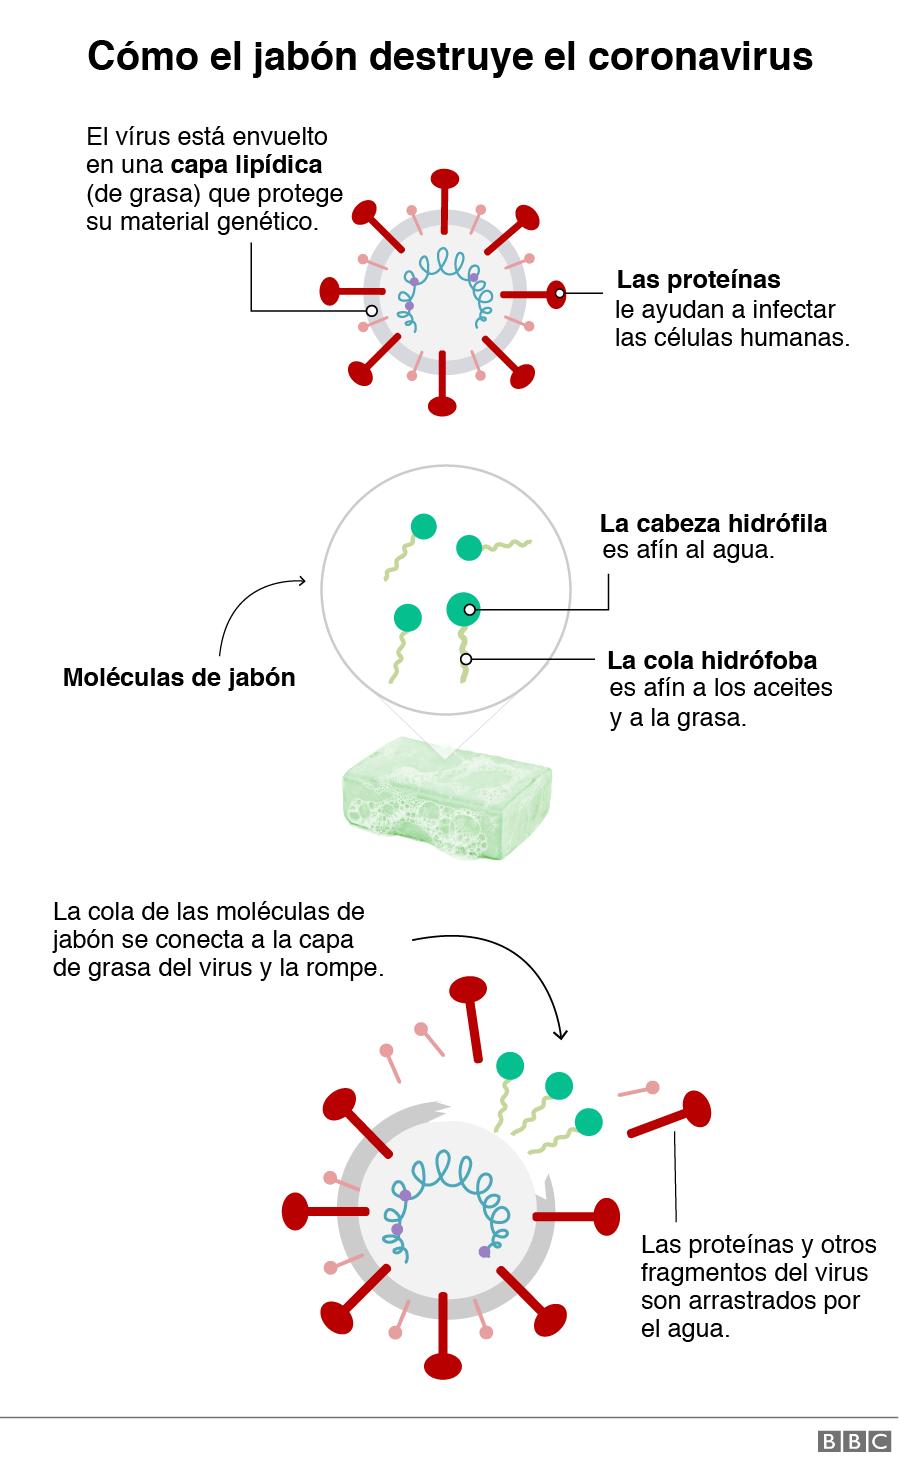 Virus de la cabeza brasileña